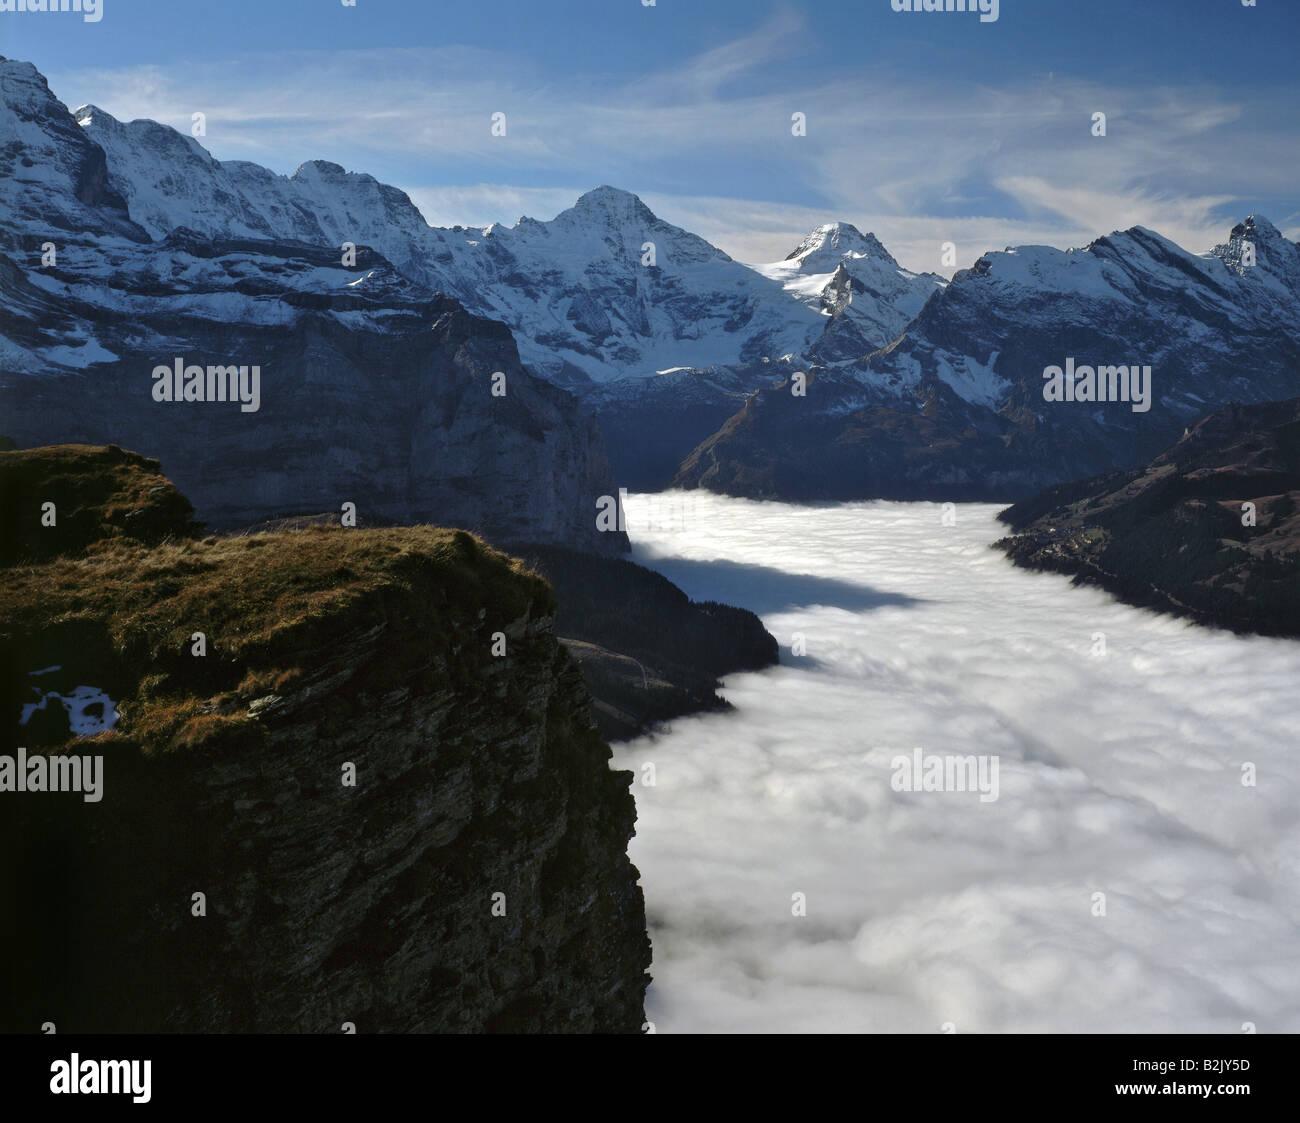 Geografia / viaggi, Svizzera, Berna, paesaggi, Additional-Rights-Clearance-Info-Not-Available Immagini Stock